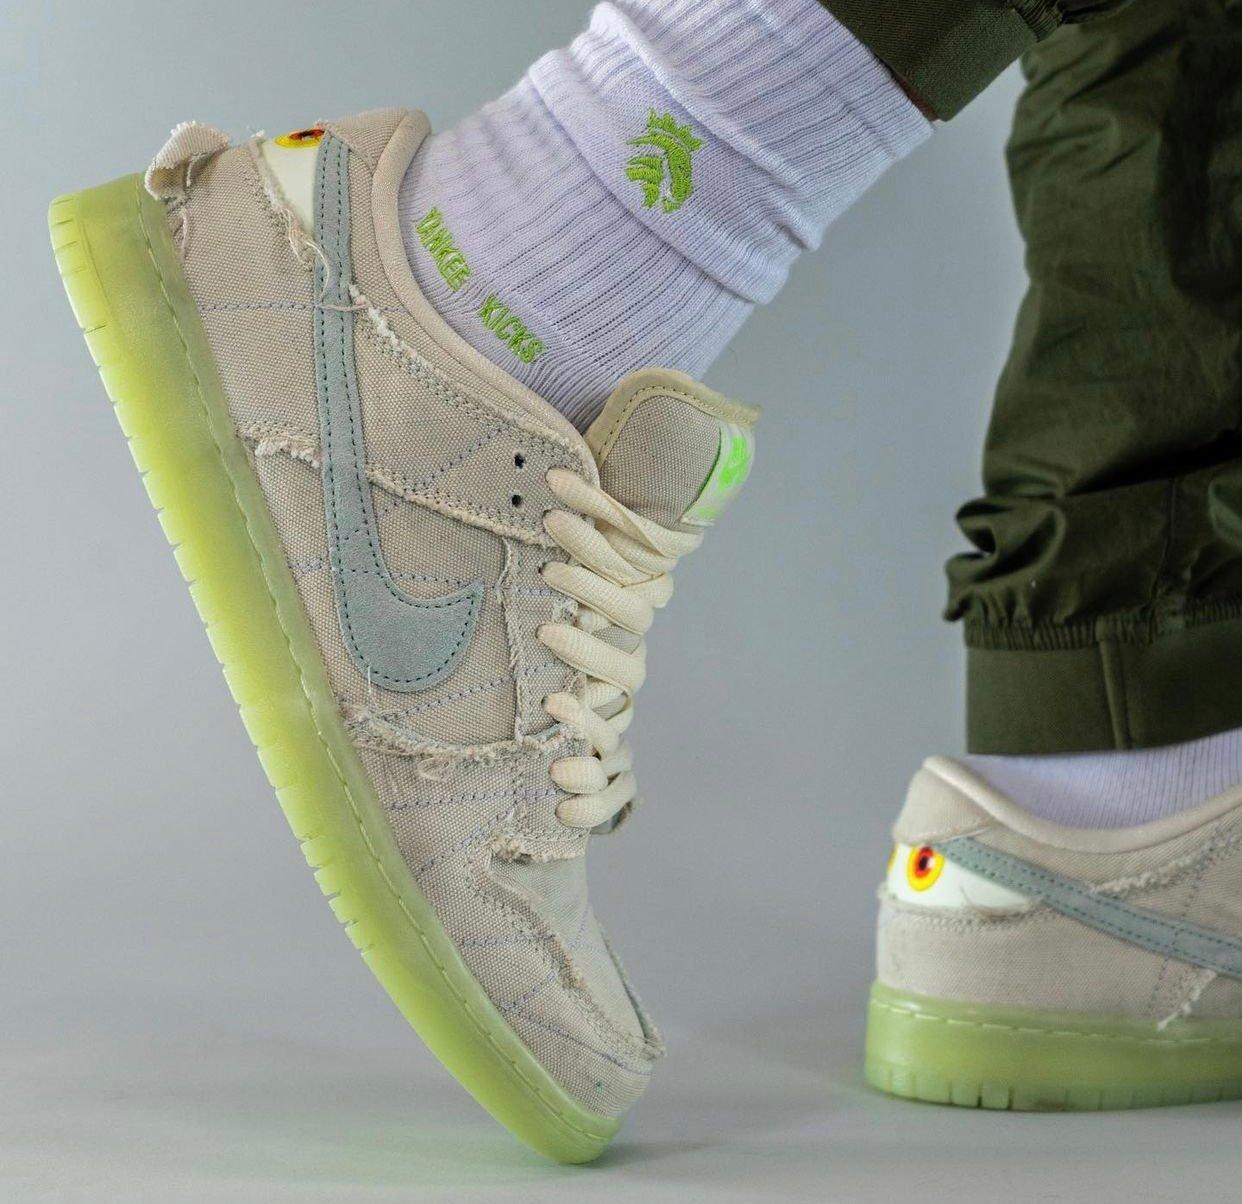 Nike SB Dunk Low Mummy Halloween DM0774-111 On-Feet